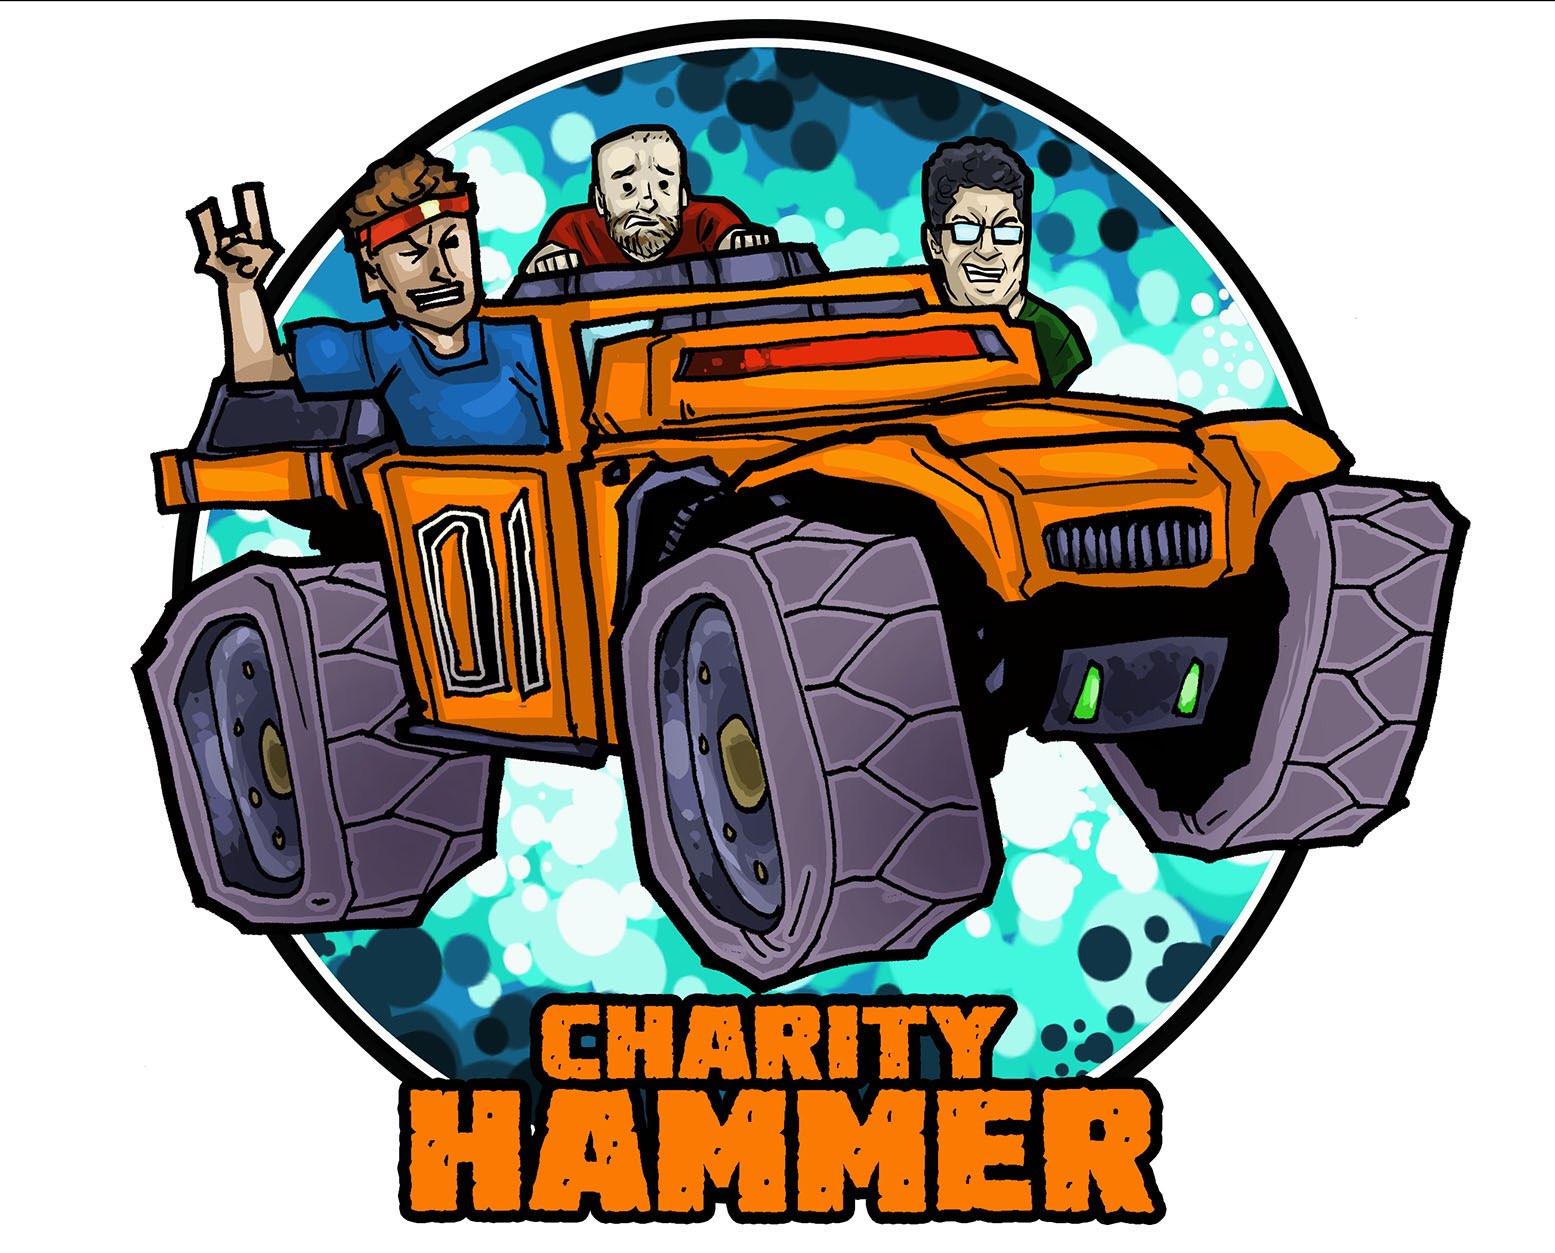 Charity Hammer